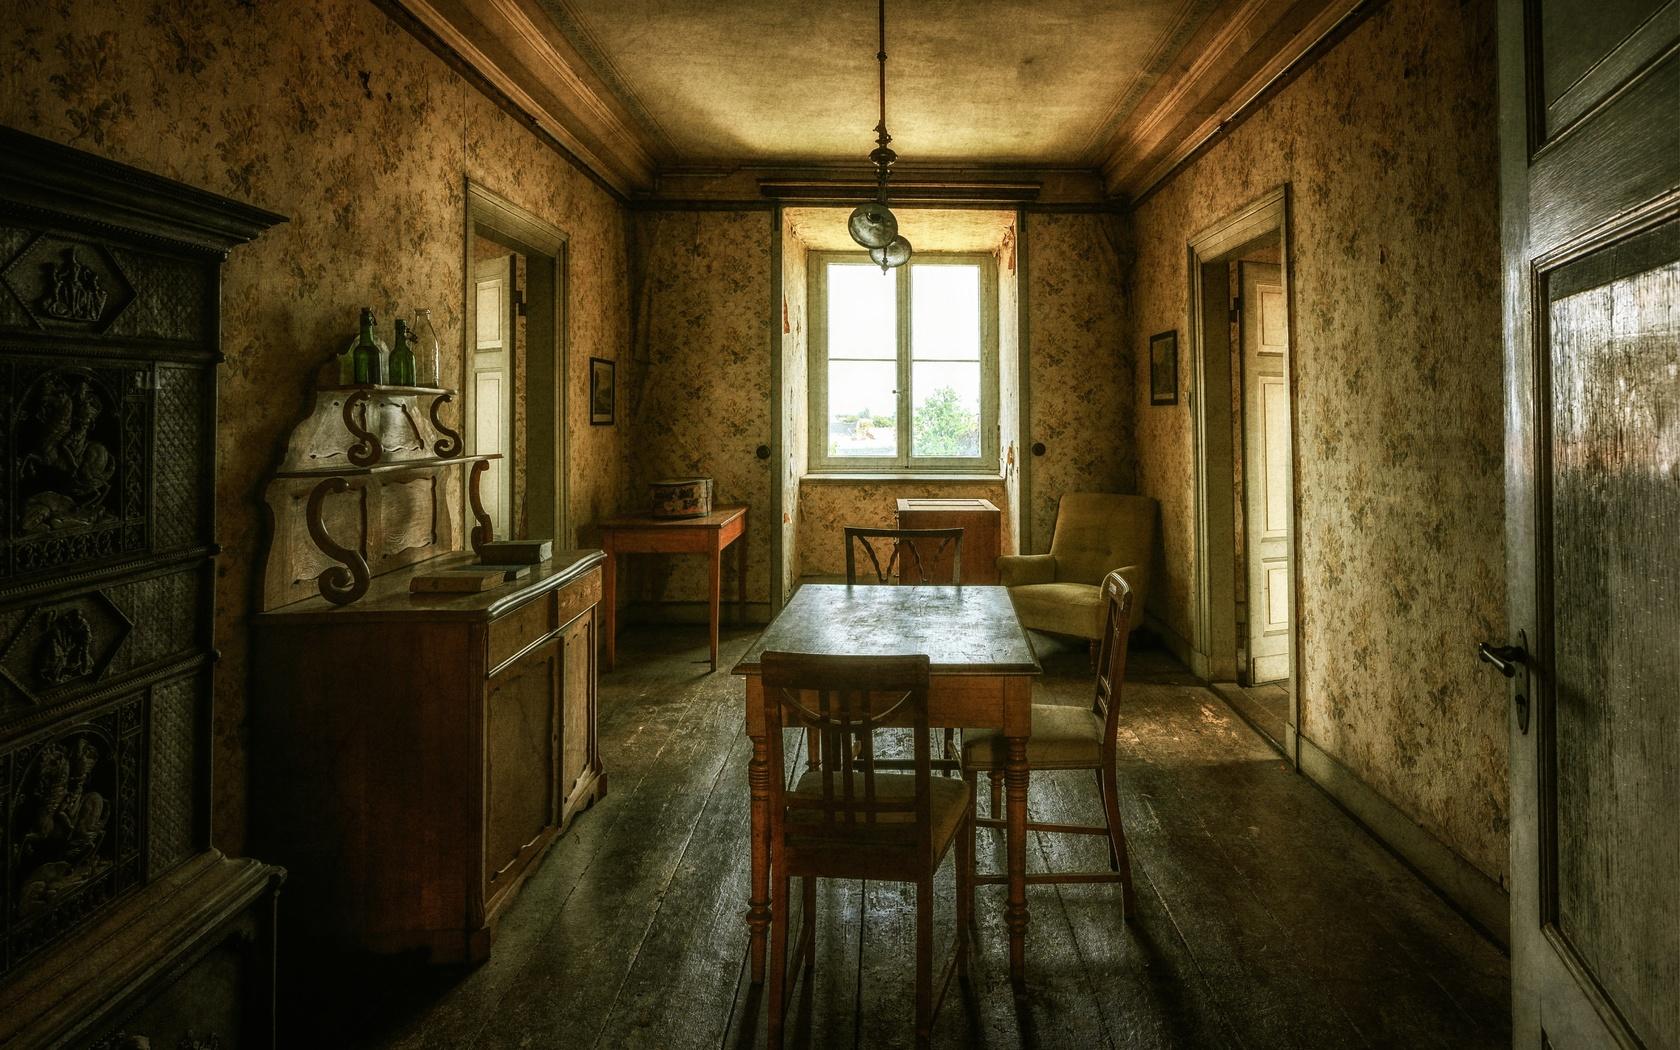 дом, комната, интерьер, ретро